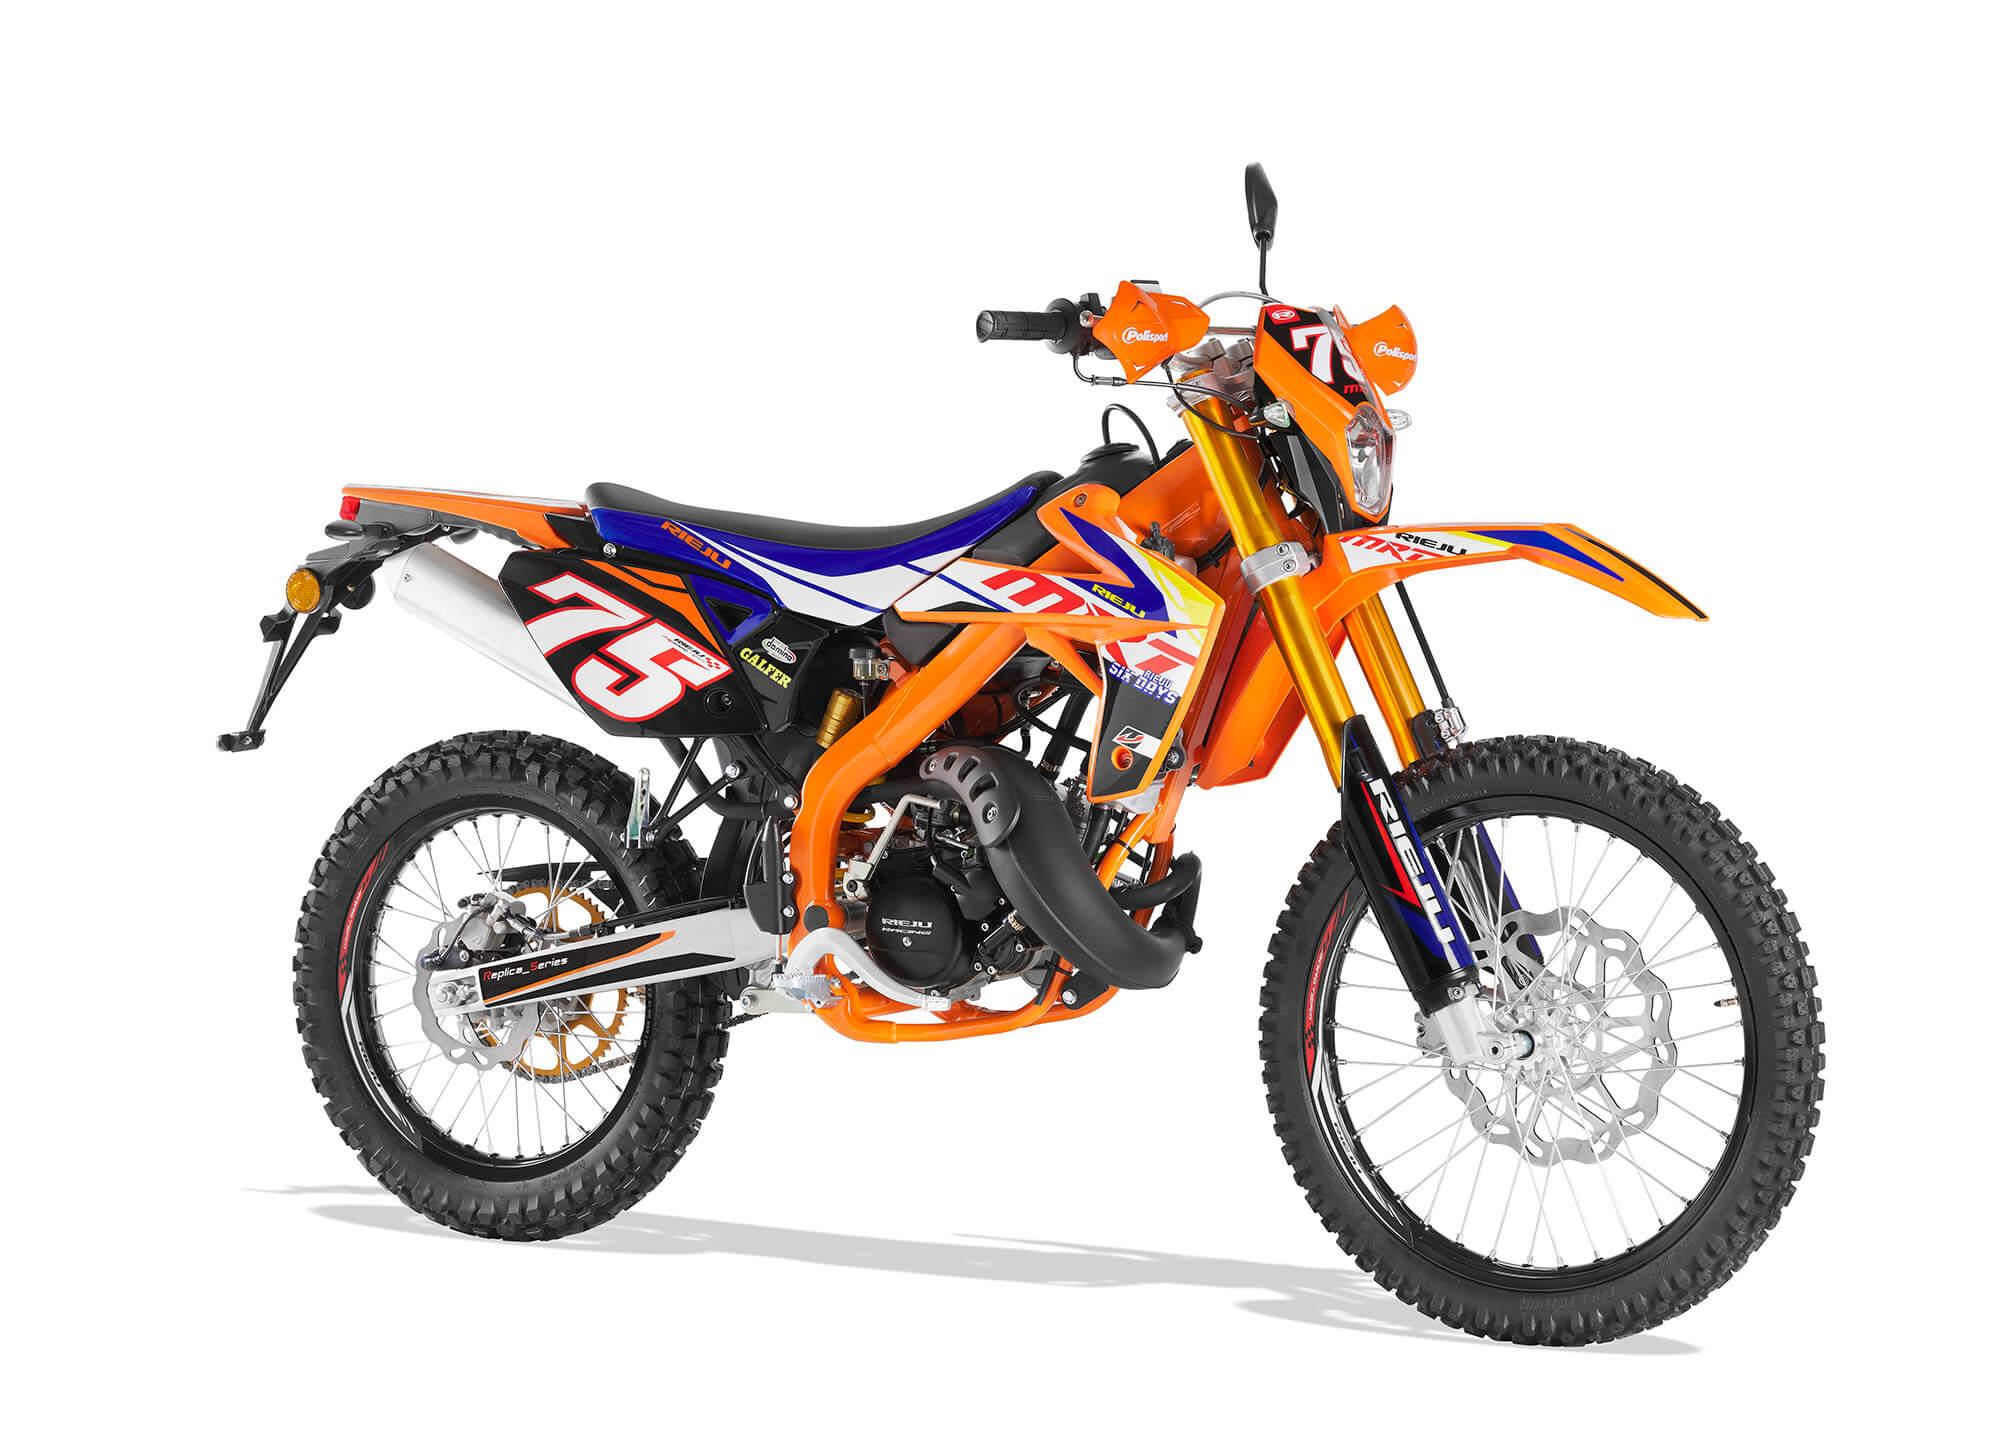 comprar-motos-rieju-mrt-pro-replica-50-naranja-motissimo-barcelona